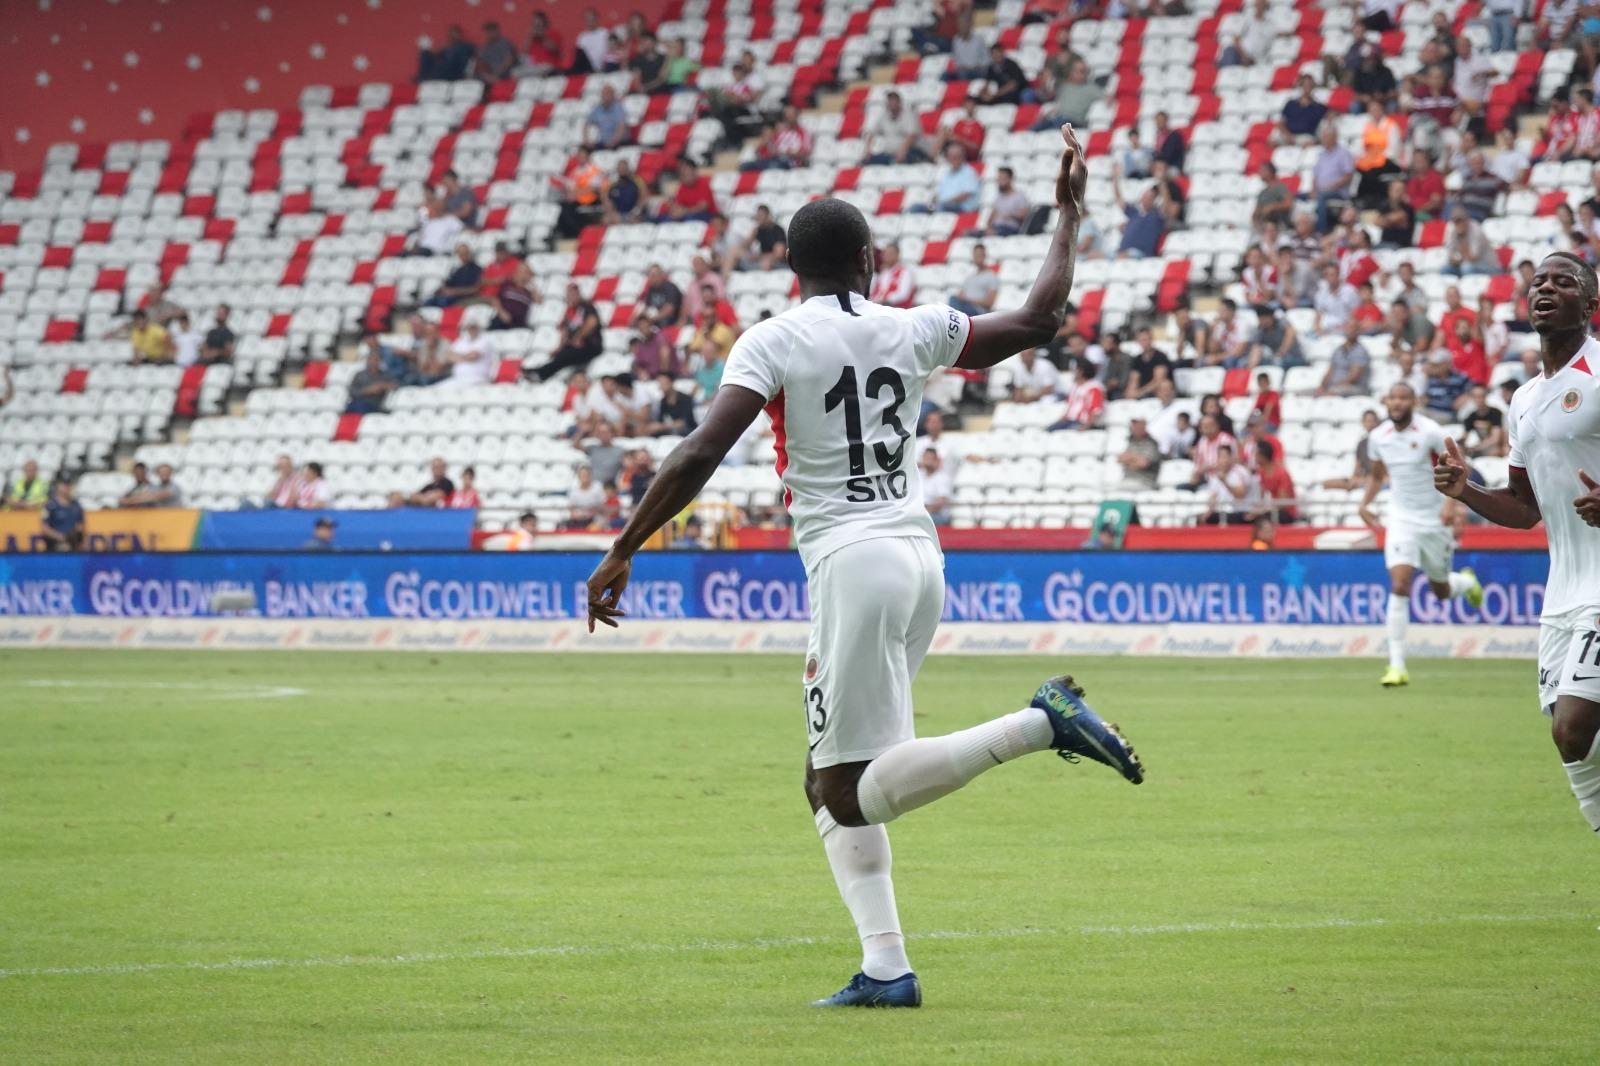 Sio'nun Süper Lig'de kaç gol hedefi var?